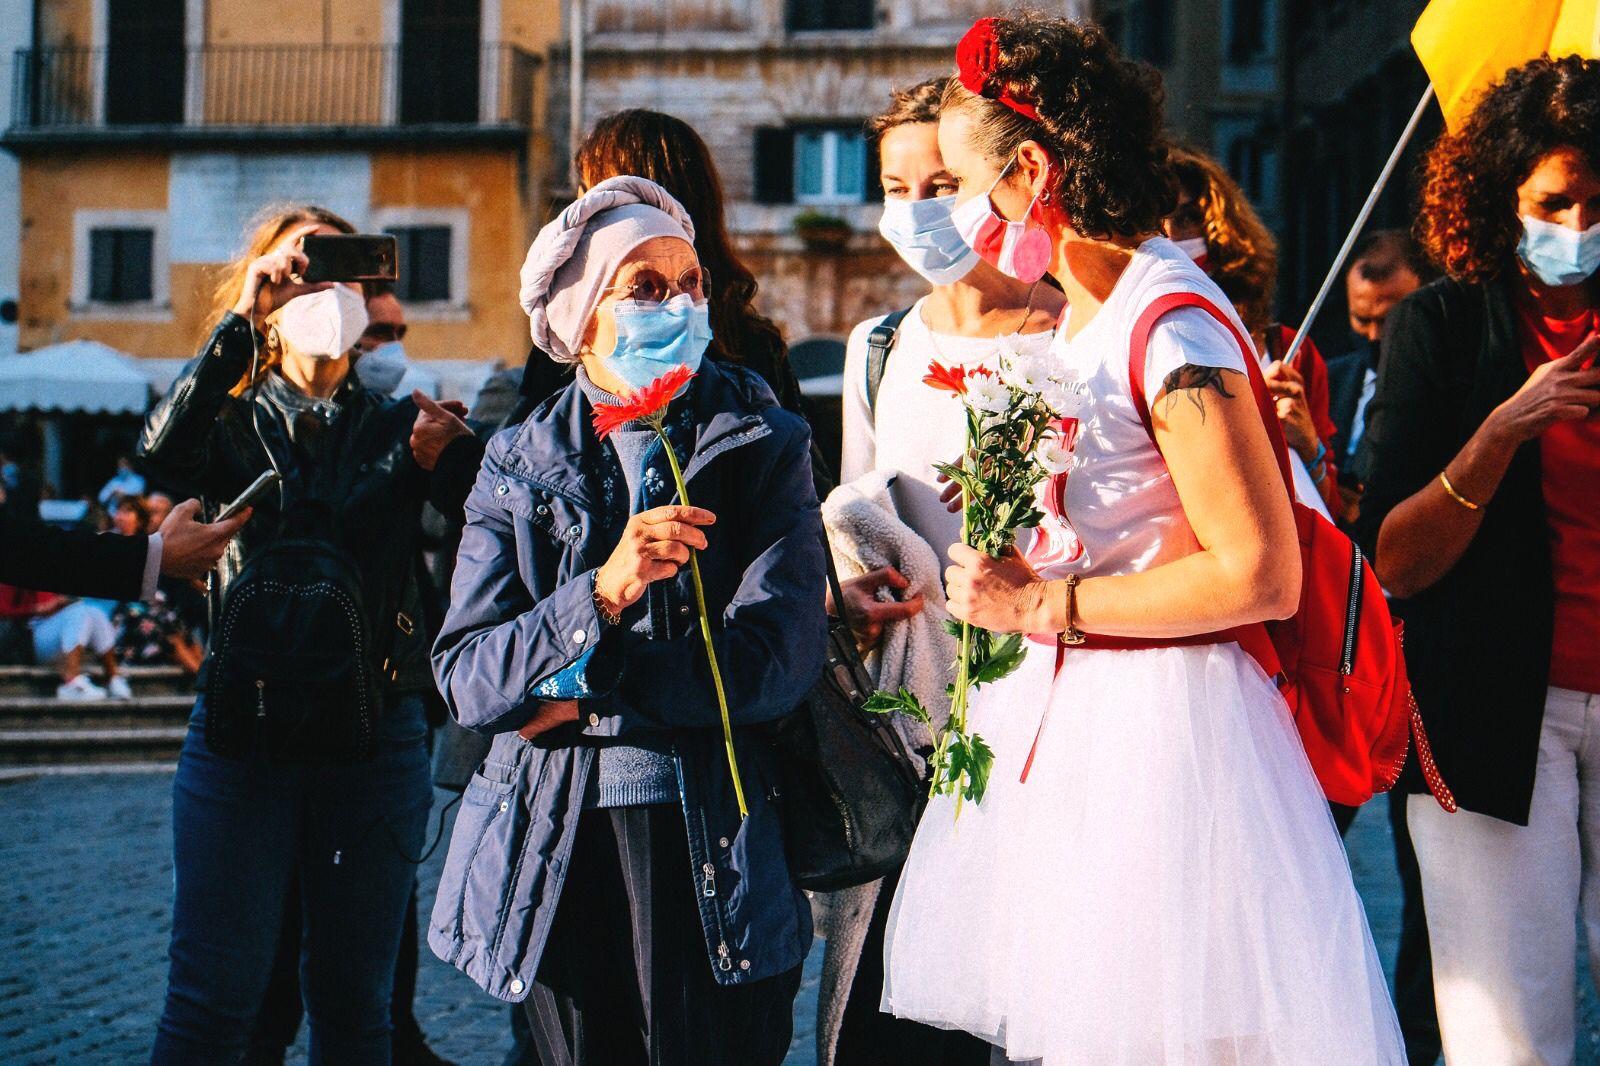 Ekaterina Ziuziuk con Emma Bonino durante una manifestazione in Italia, foto concessa da Ekaterina Ziuziuk